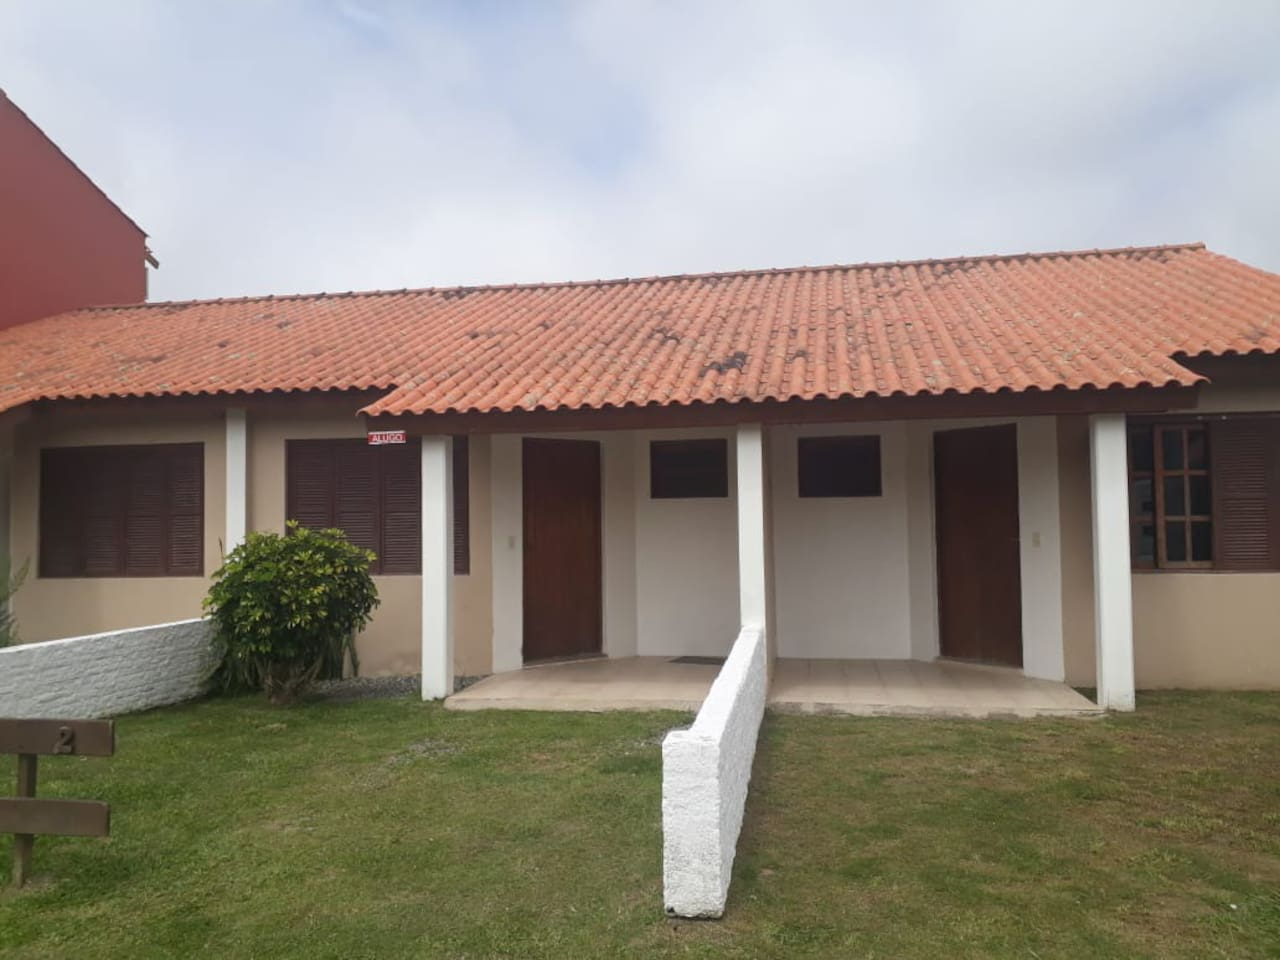 Casa 1 - Girassol  Casa 2 - Margarida Casa 3 - Violeta